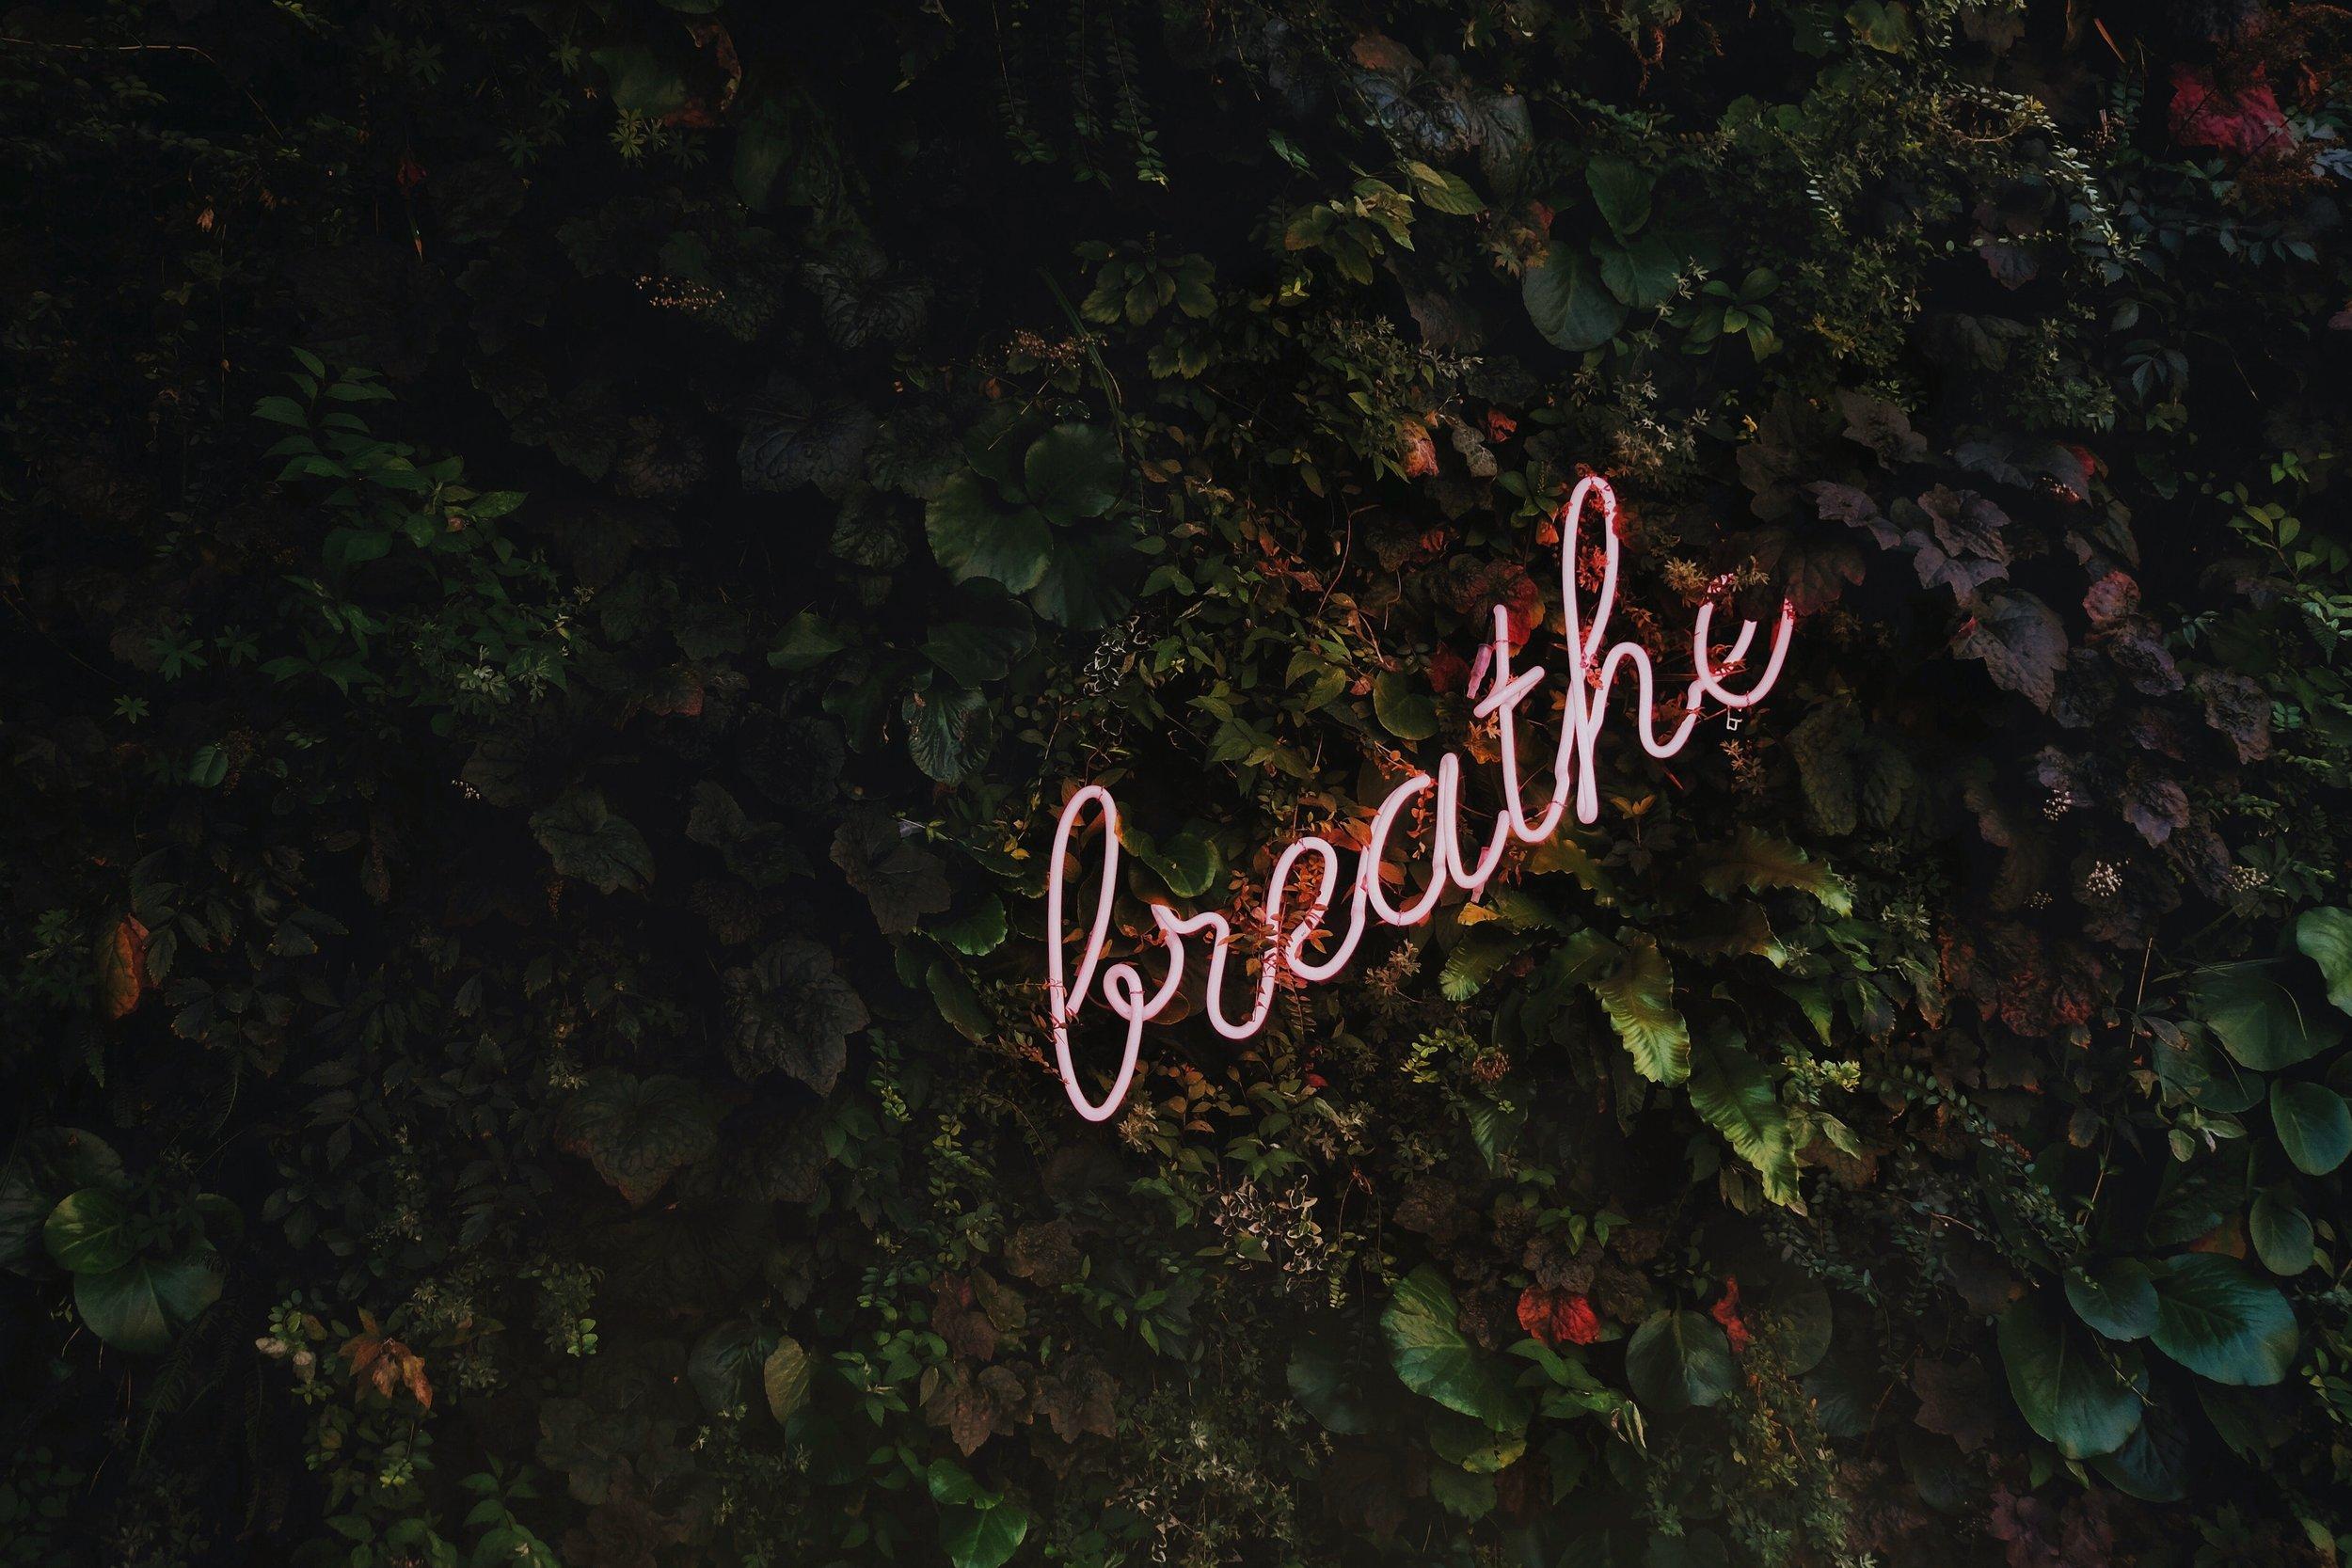 breathe-image.jpg